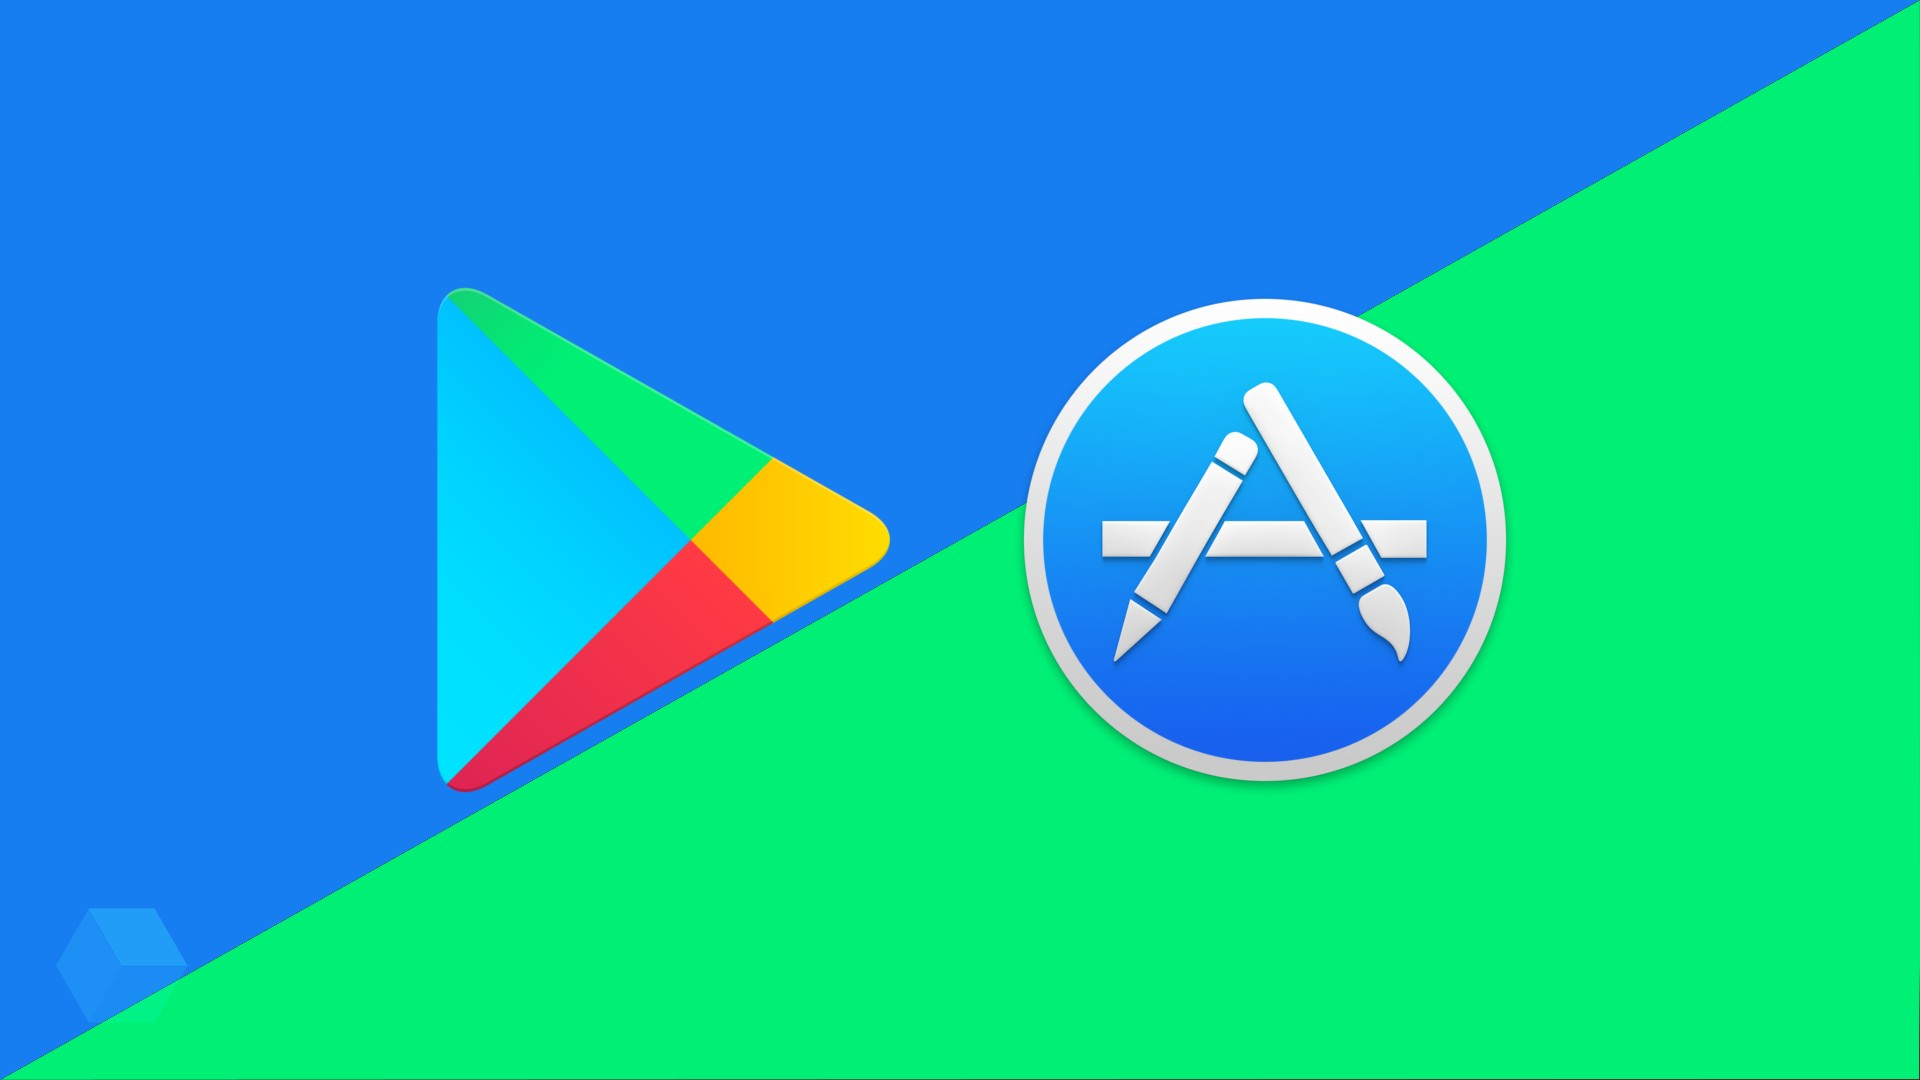 Play Маркет опережает App Store на 160% по числу загрузок